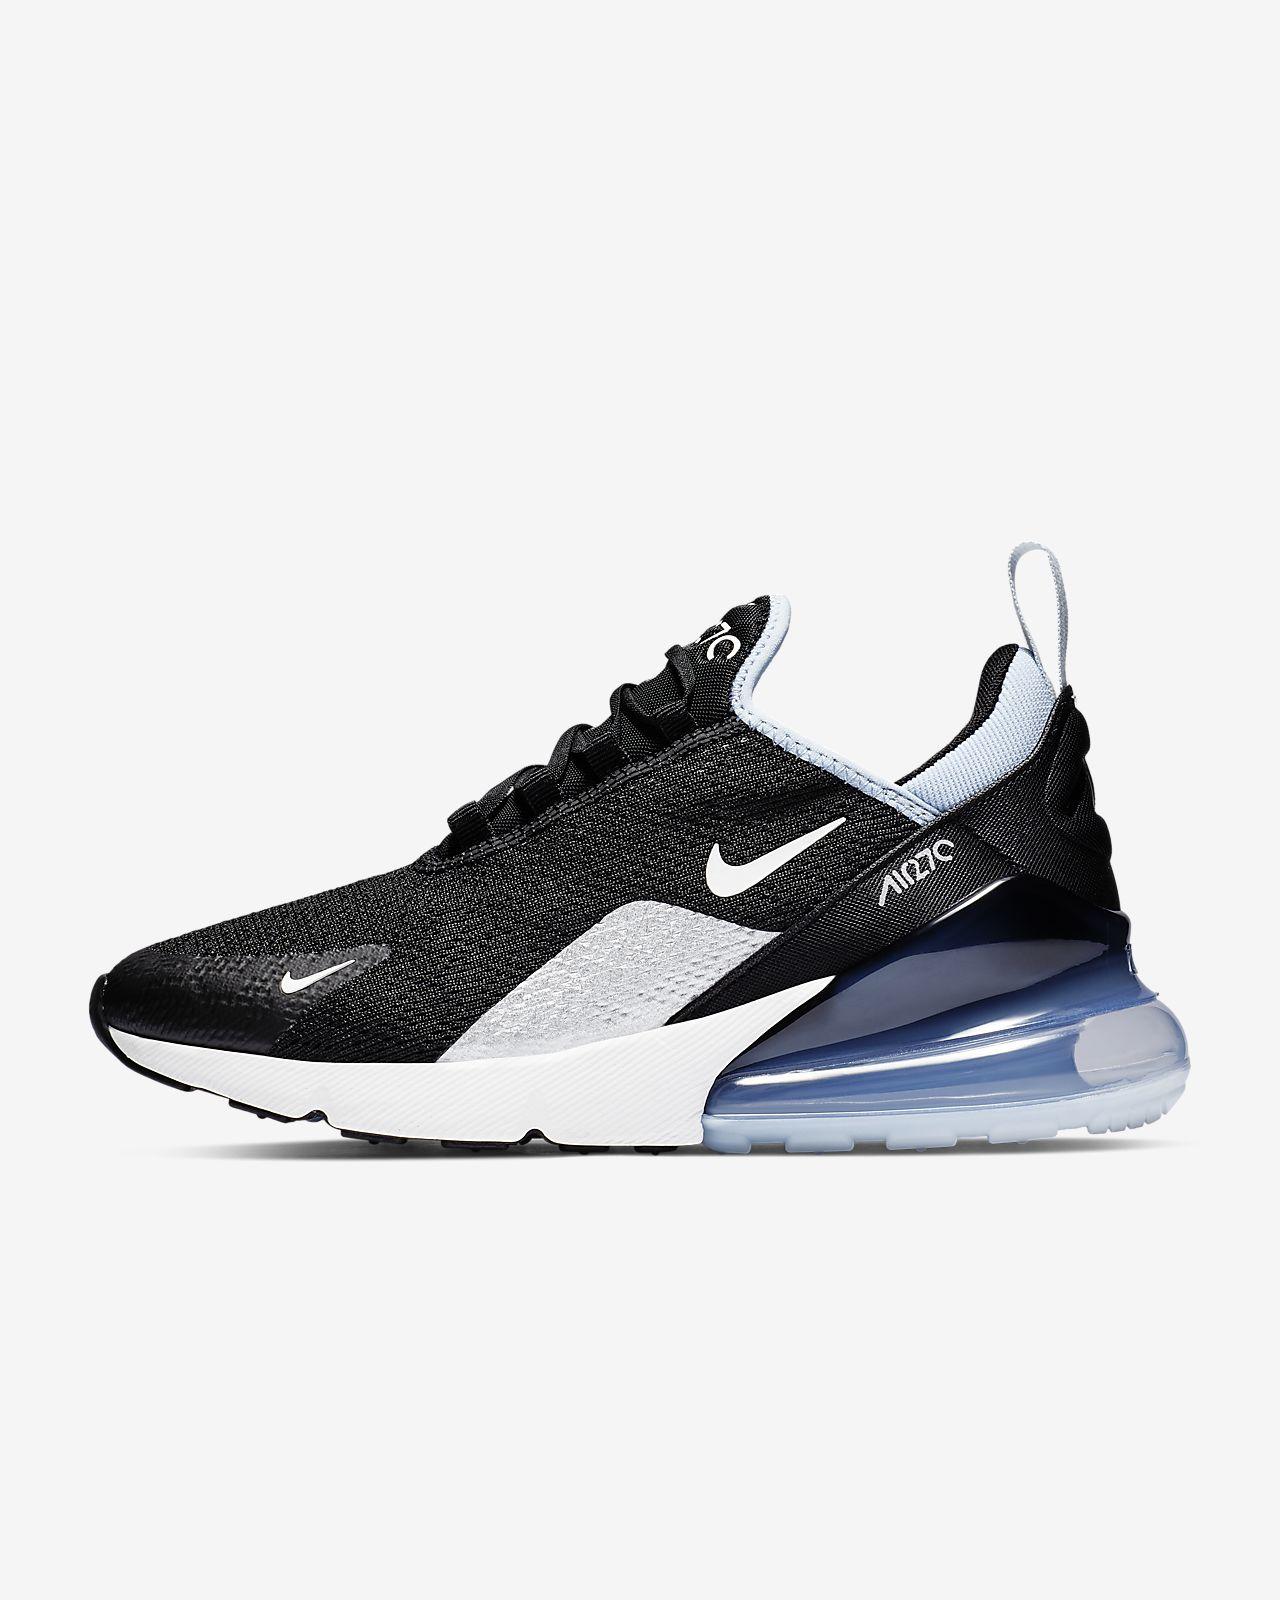 separation shoes bac05 15360 ... Nike Air Max 270 Women s Shoe